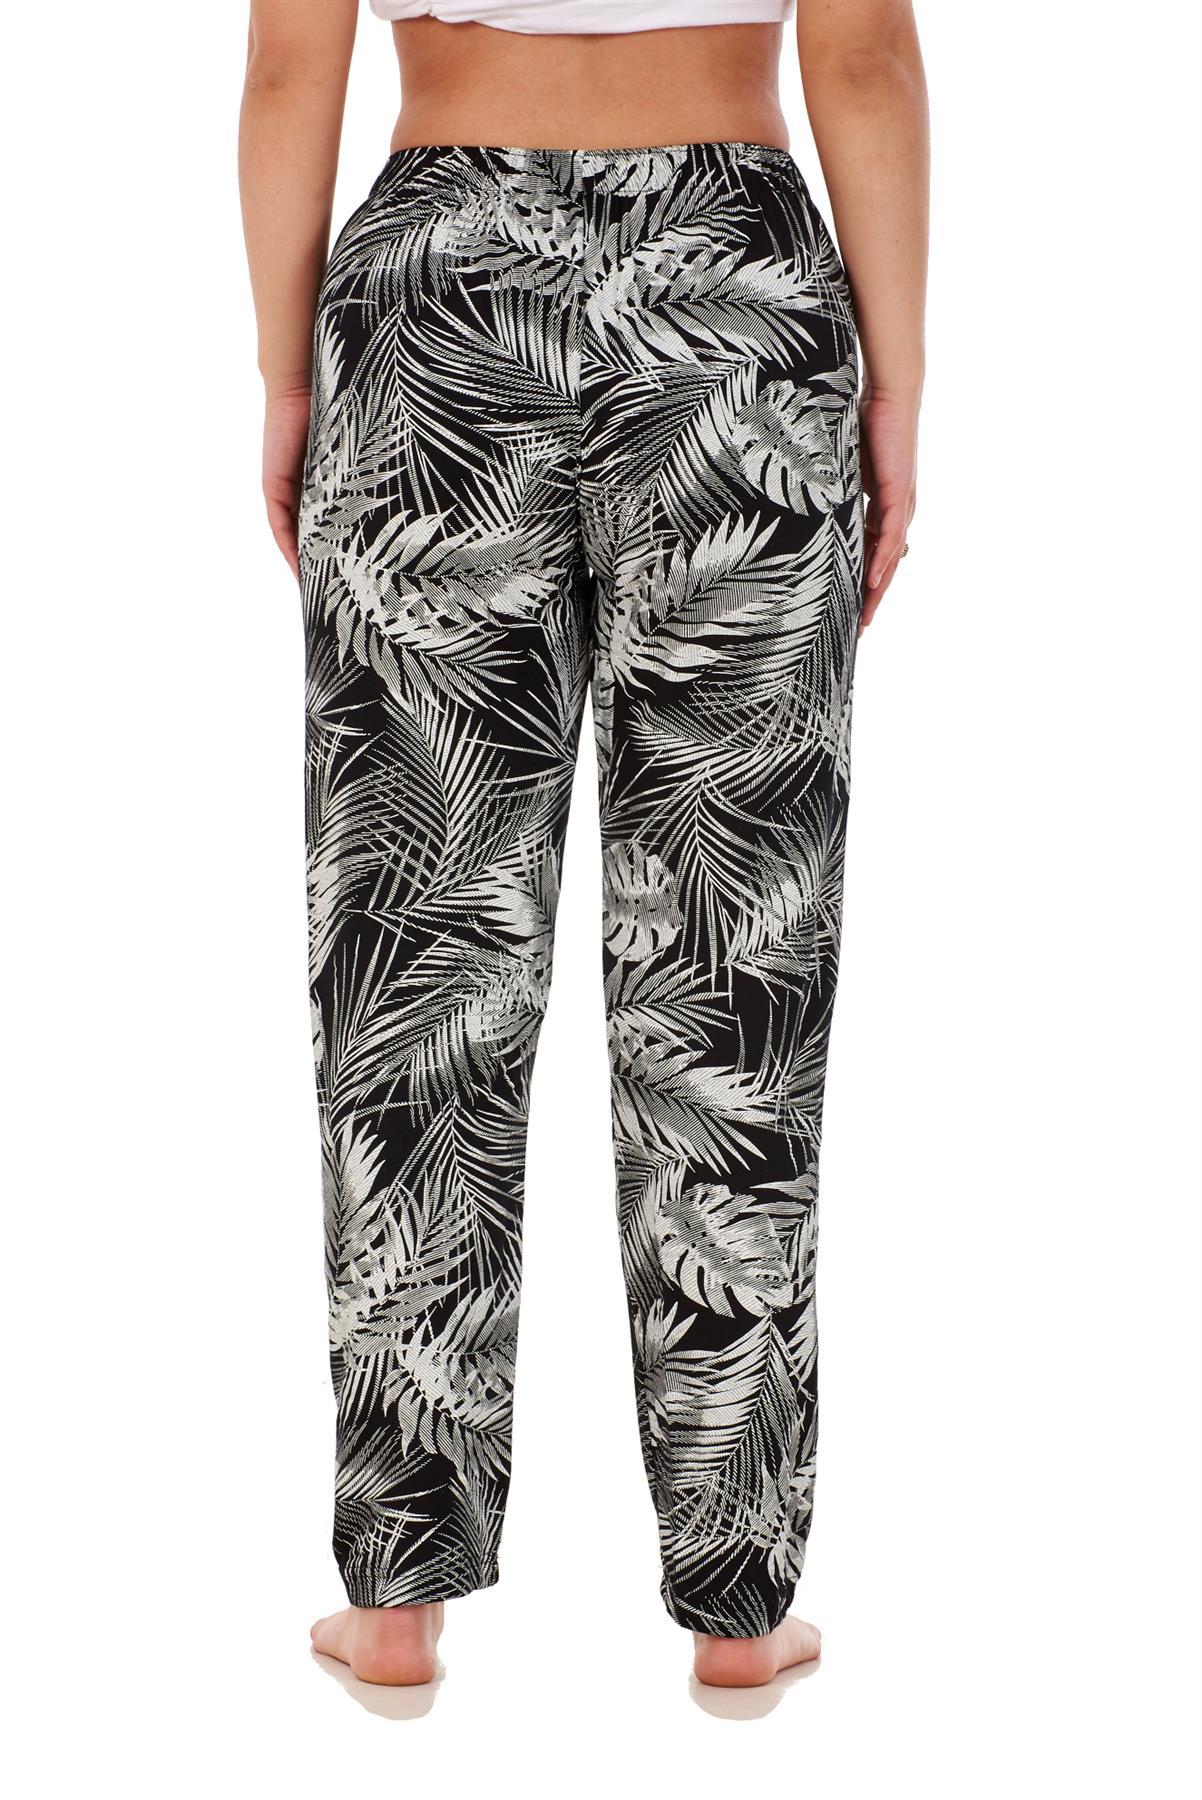 Ladies-Women-Trouser-Elasticated-Printed-Tapered-Harem-High-waist-Regular-Pants thumbnail 24